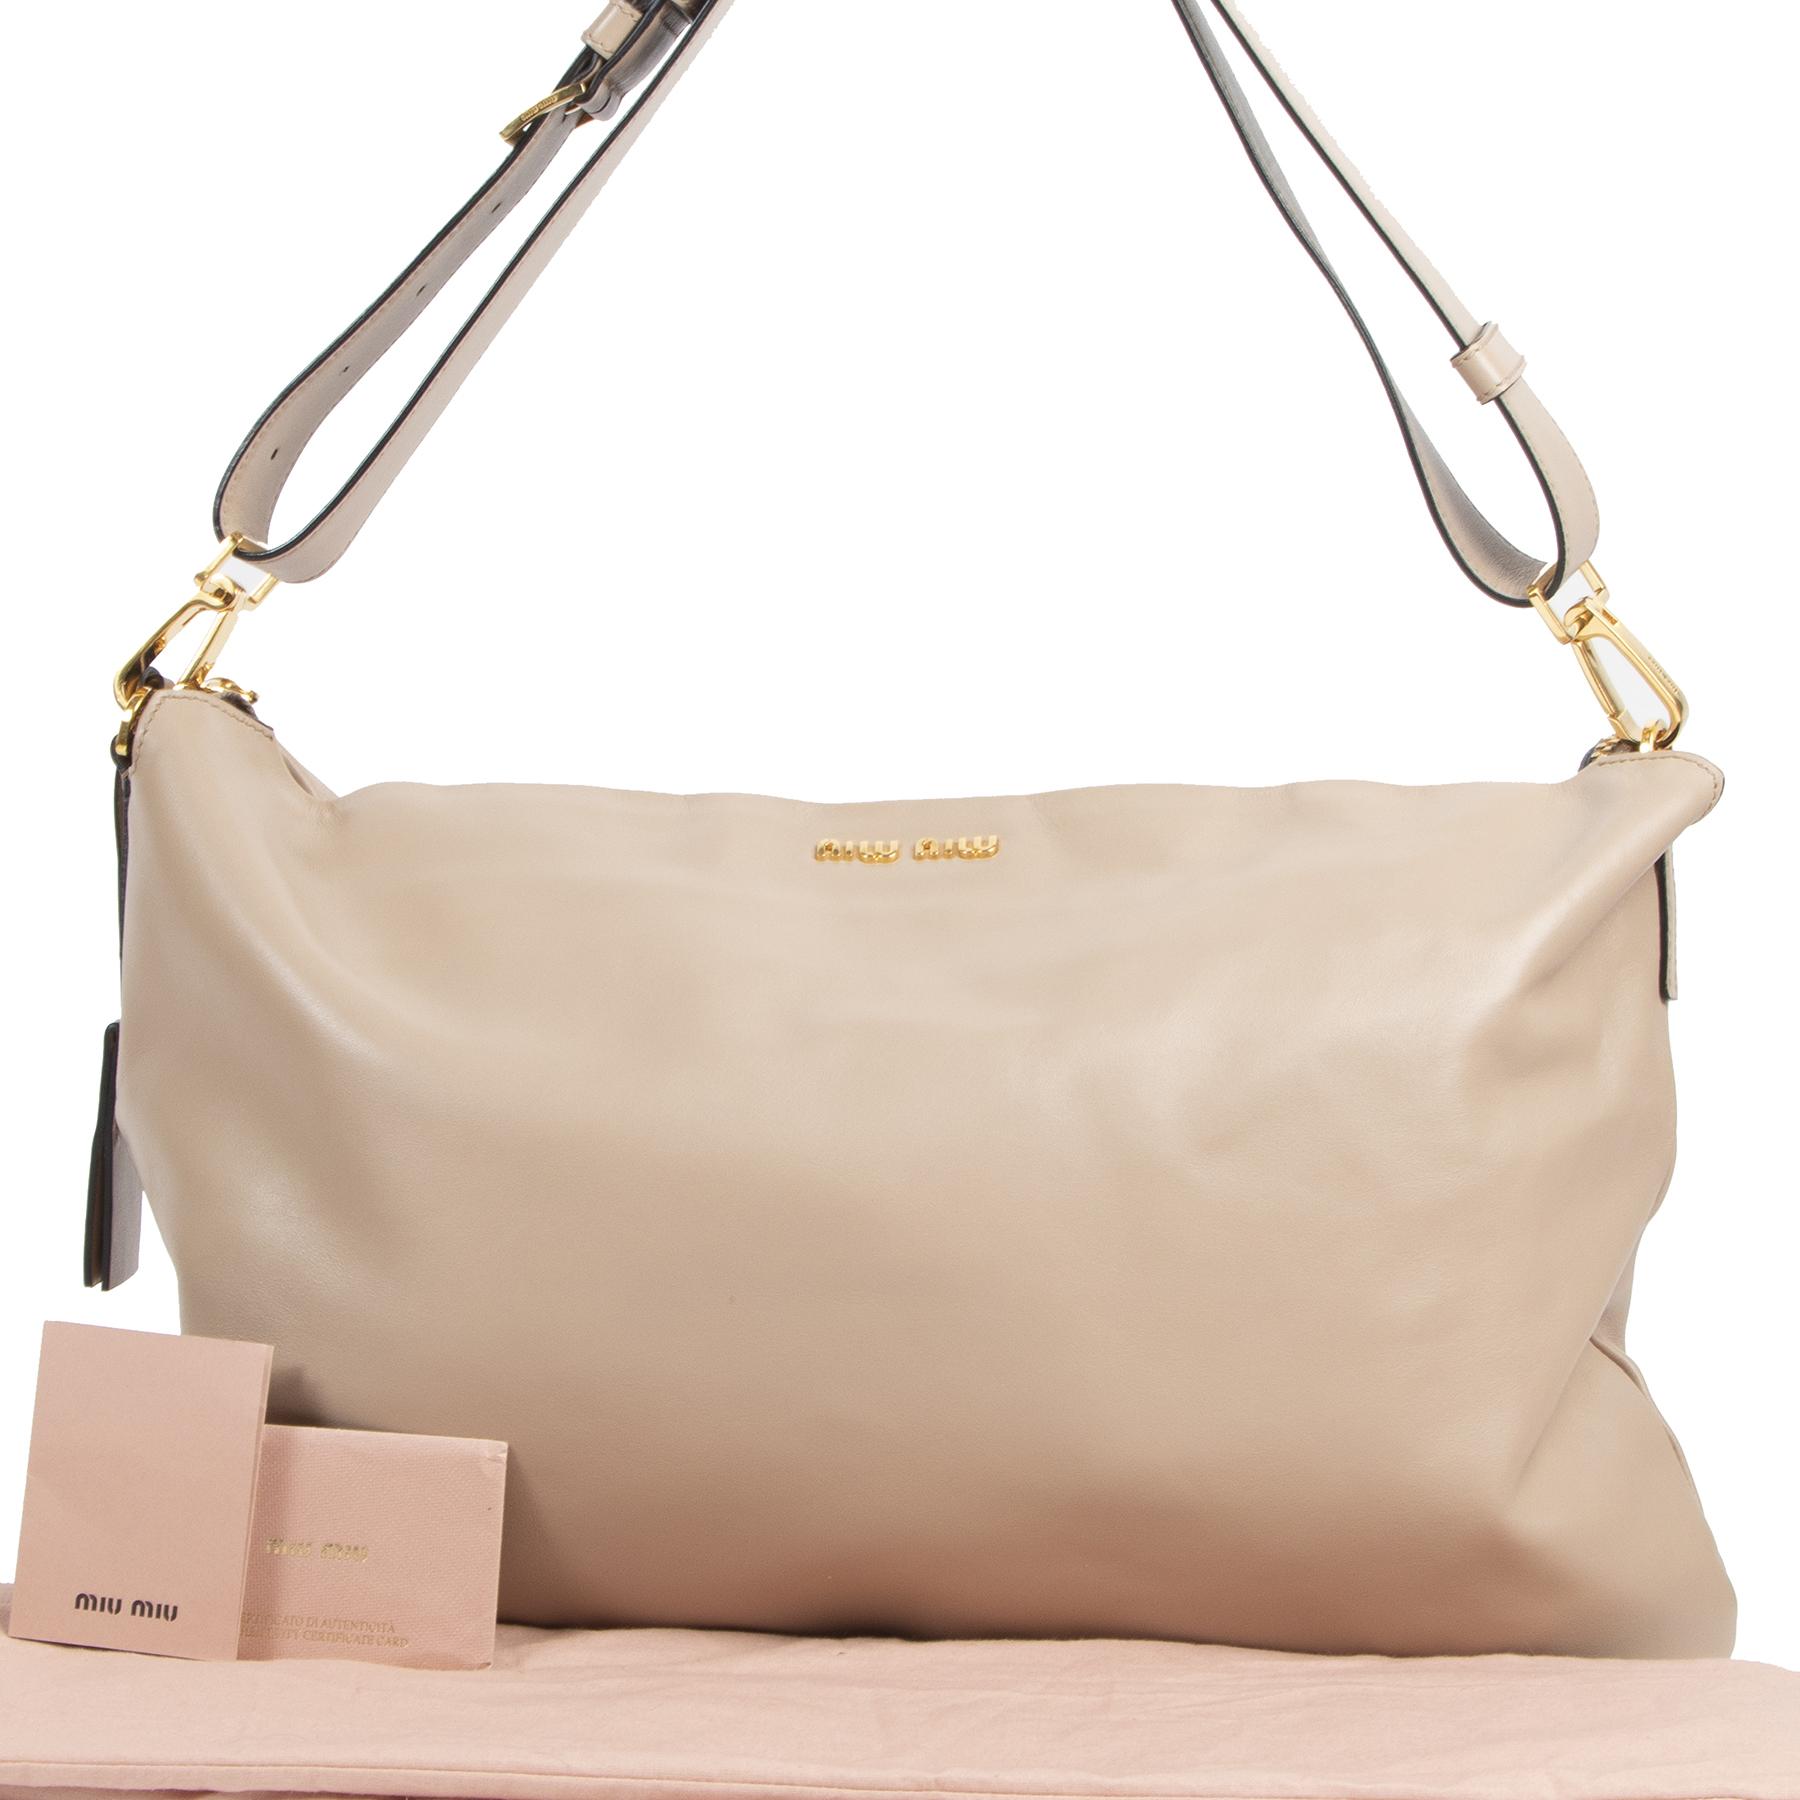 Authentic secondhand Miu Miu Beige Leather Shoulder Bag designer bags fashion luxury vintage webshop safe secure online shopping